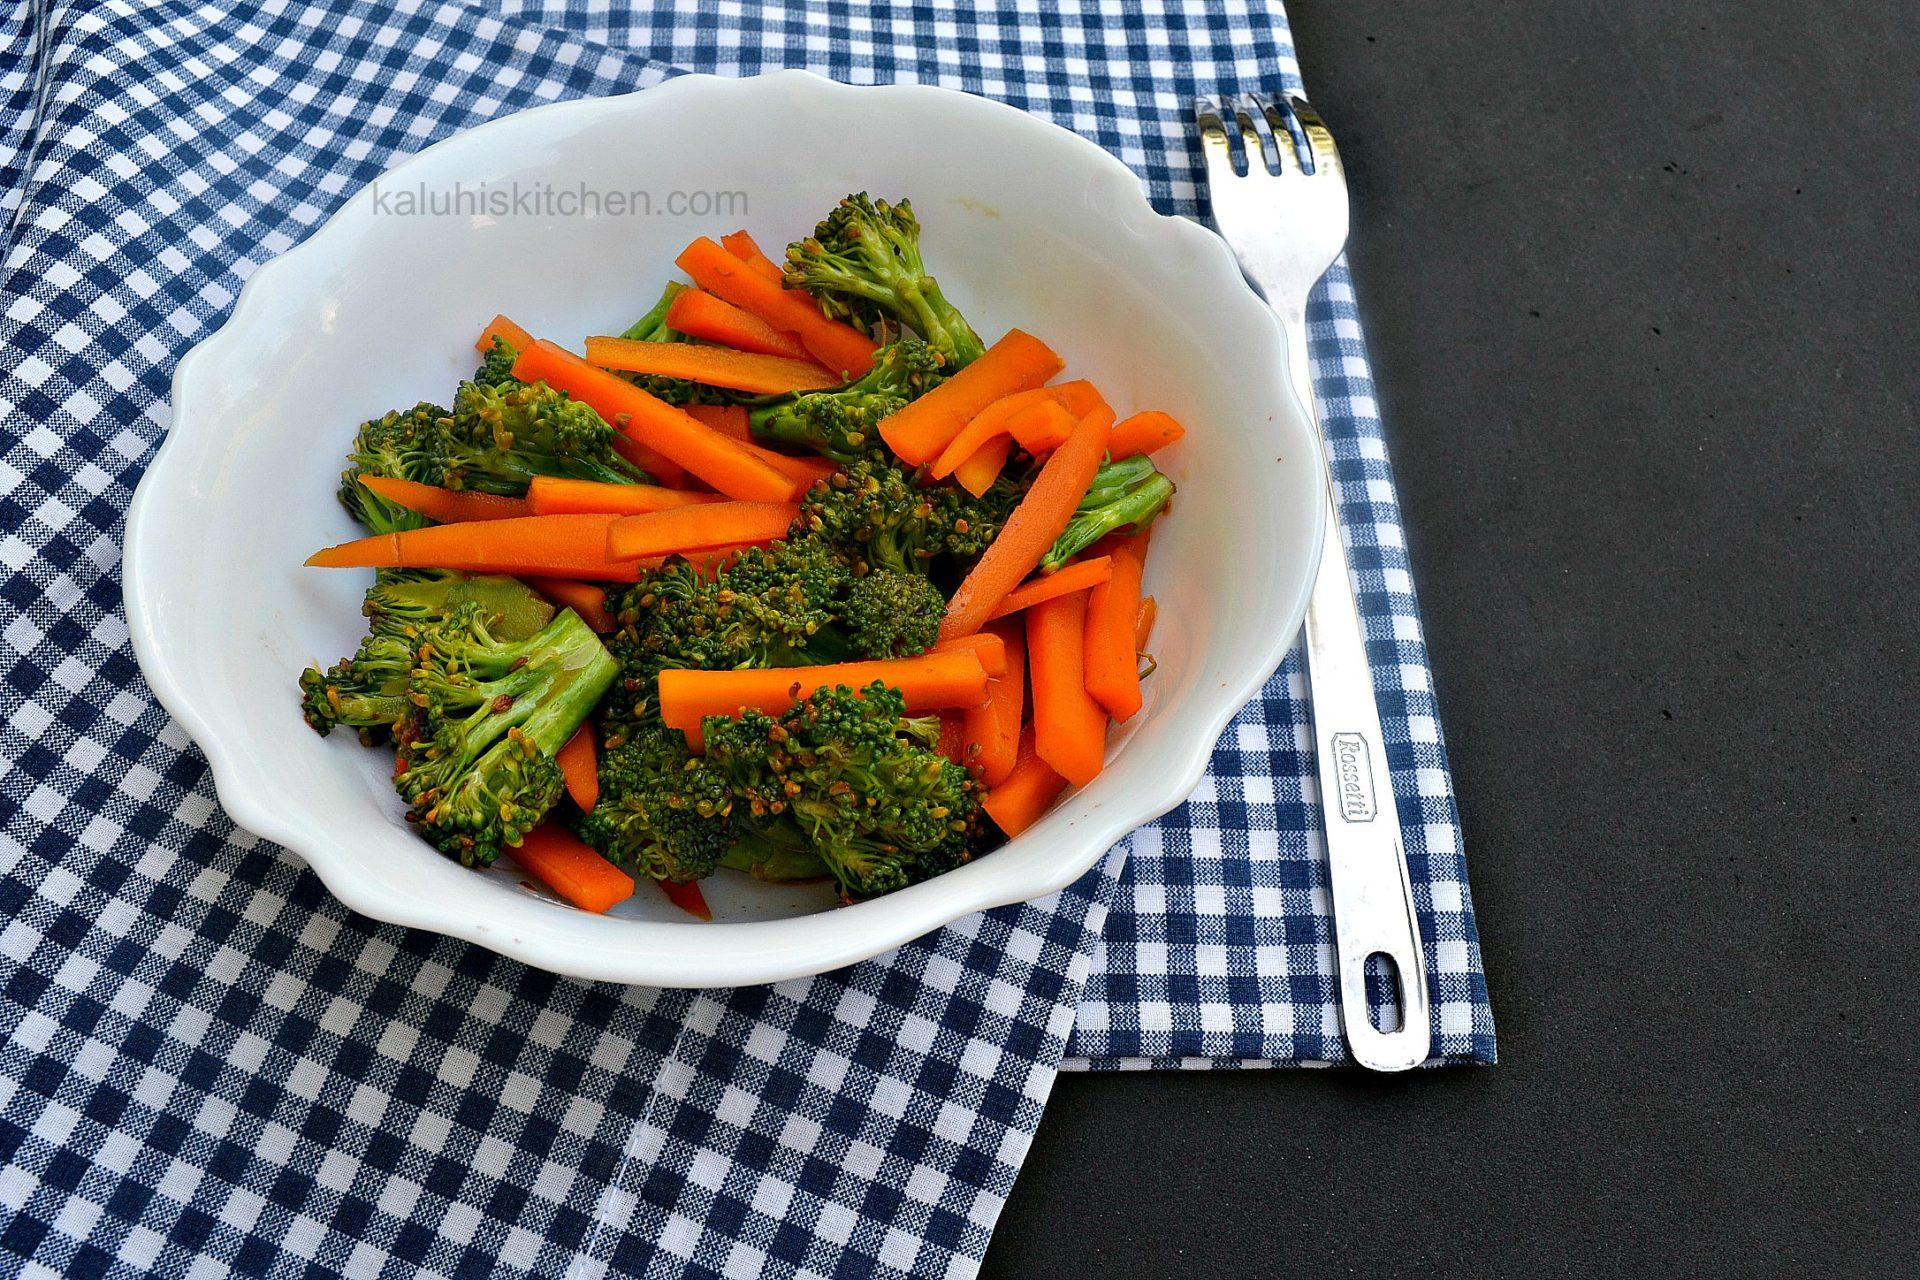 how to make broccoli taste alot more delicious_kaluhiskitchen.com_carrots and broccoli chili caramel_best kenyan food blog